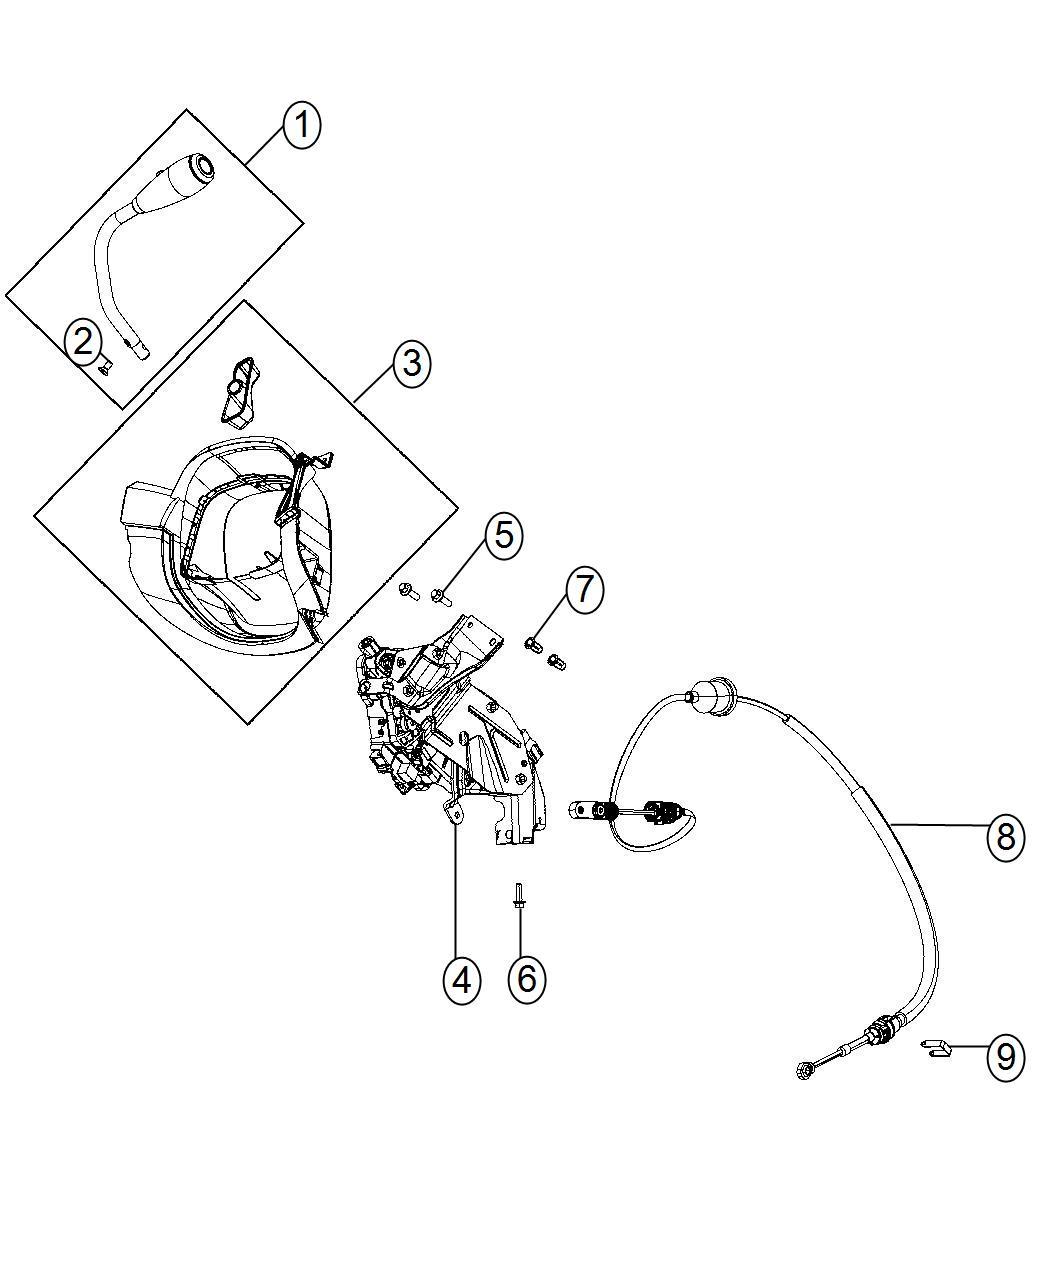 Dodge Charger Gap Hider Steering Column Shroud Trim No